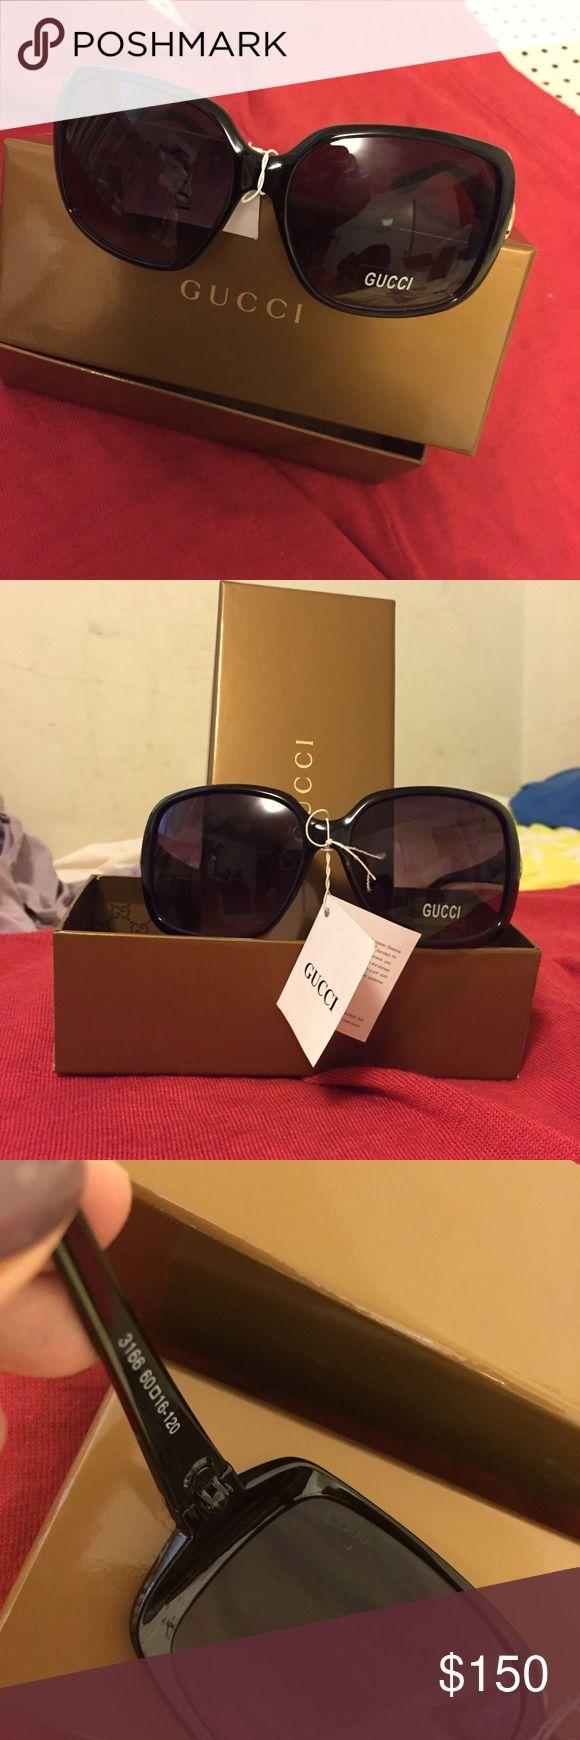 Gucci new sunglasses! 🕶🕶 super cute/elegant sunglasses😎😎😎💕💕💕 Gucci Accessories Sunglasses